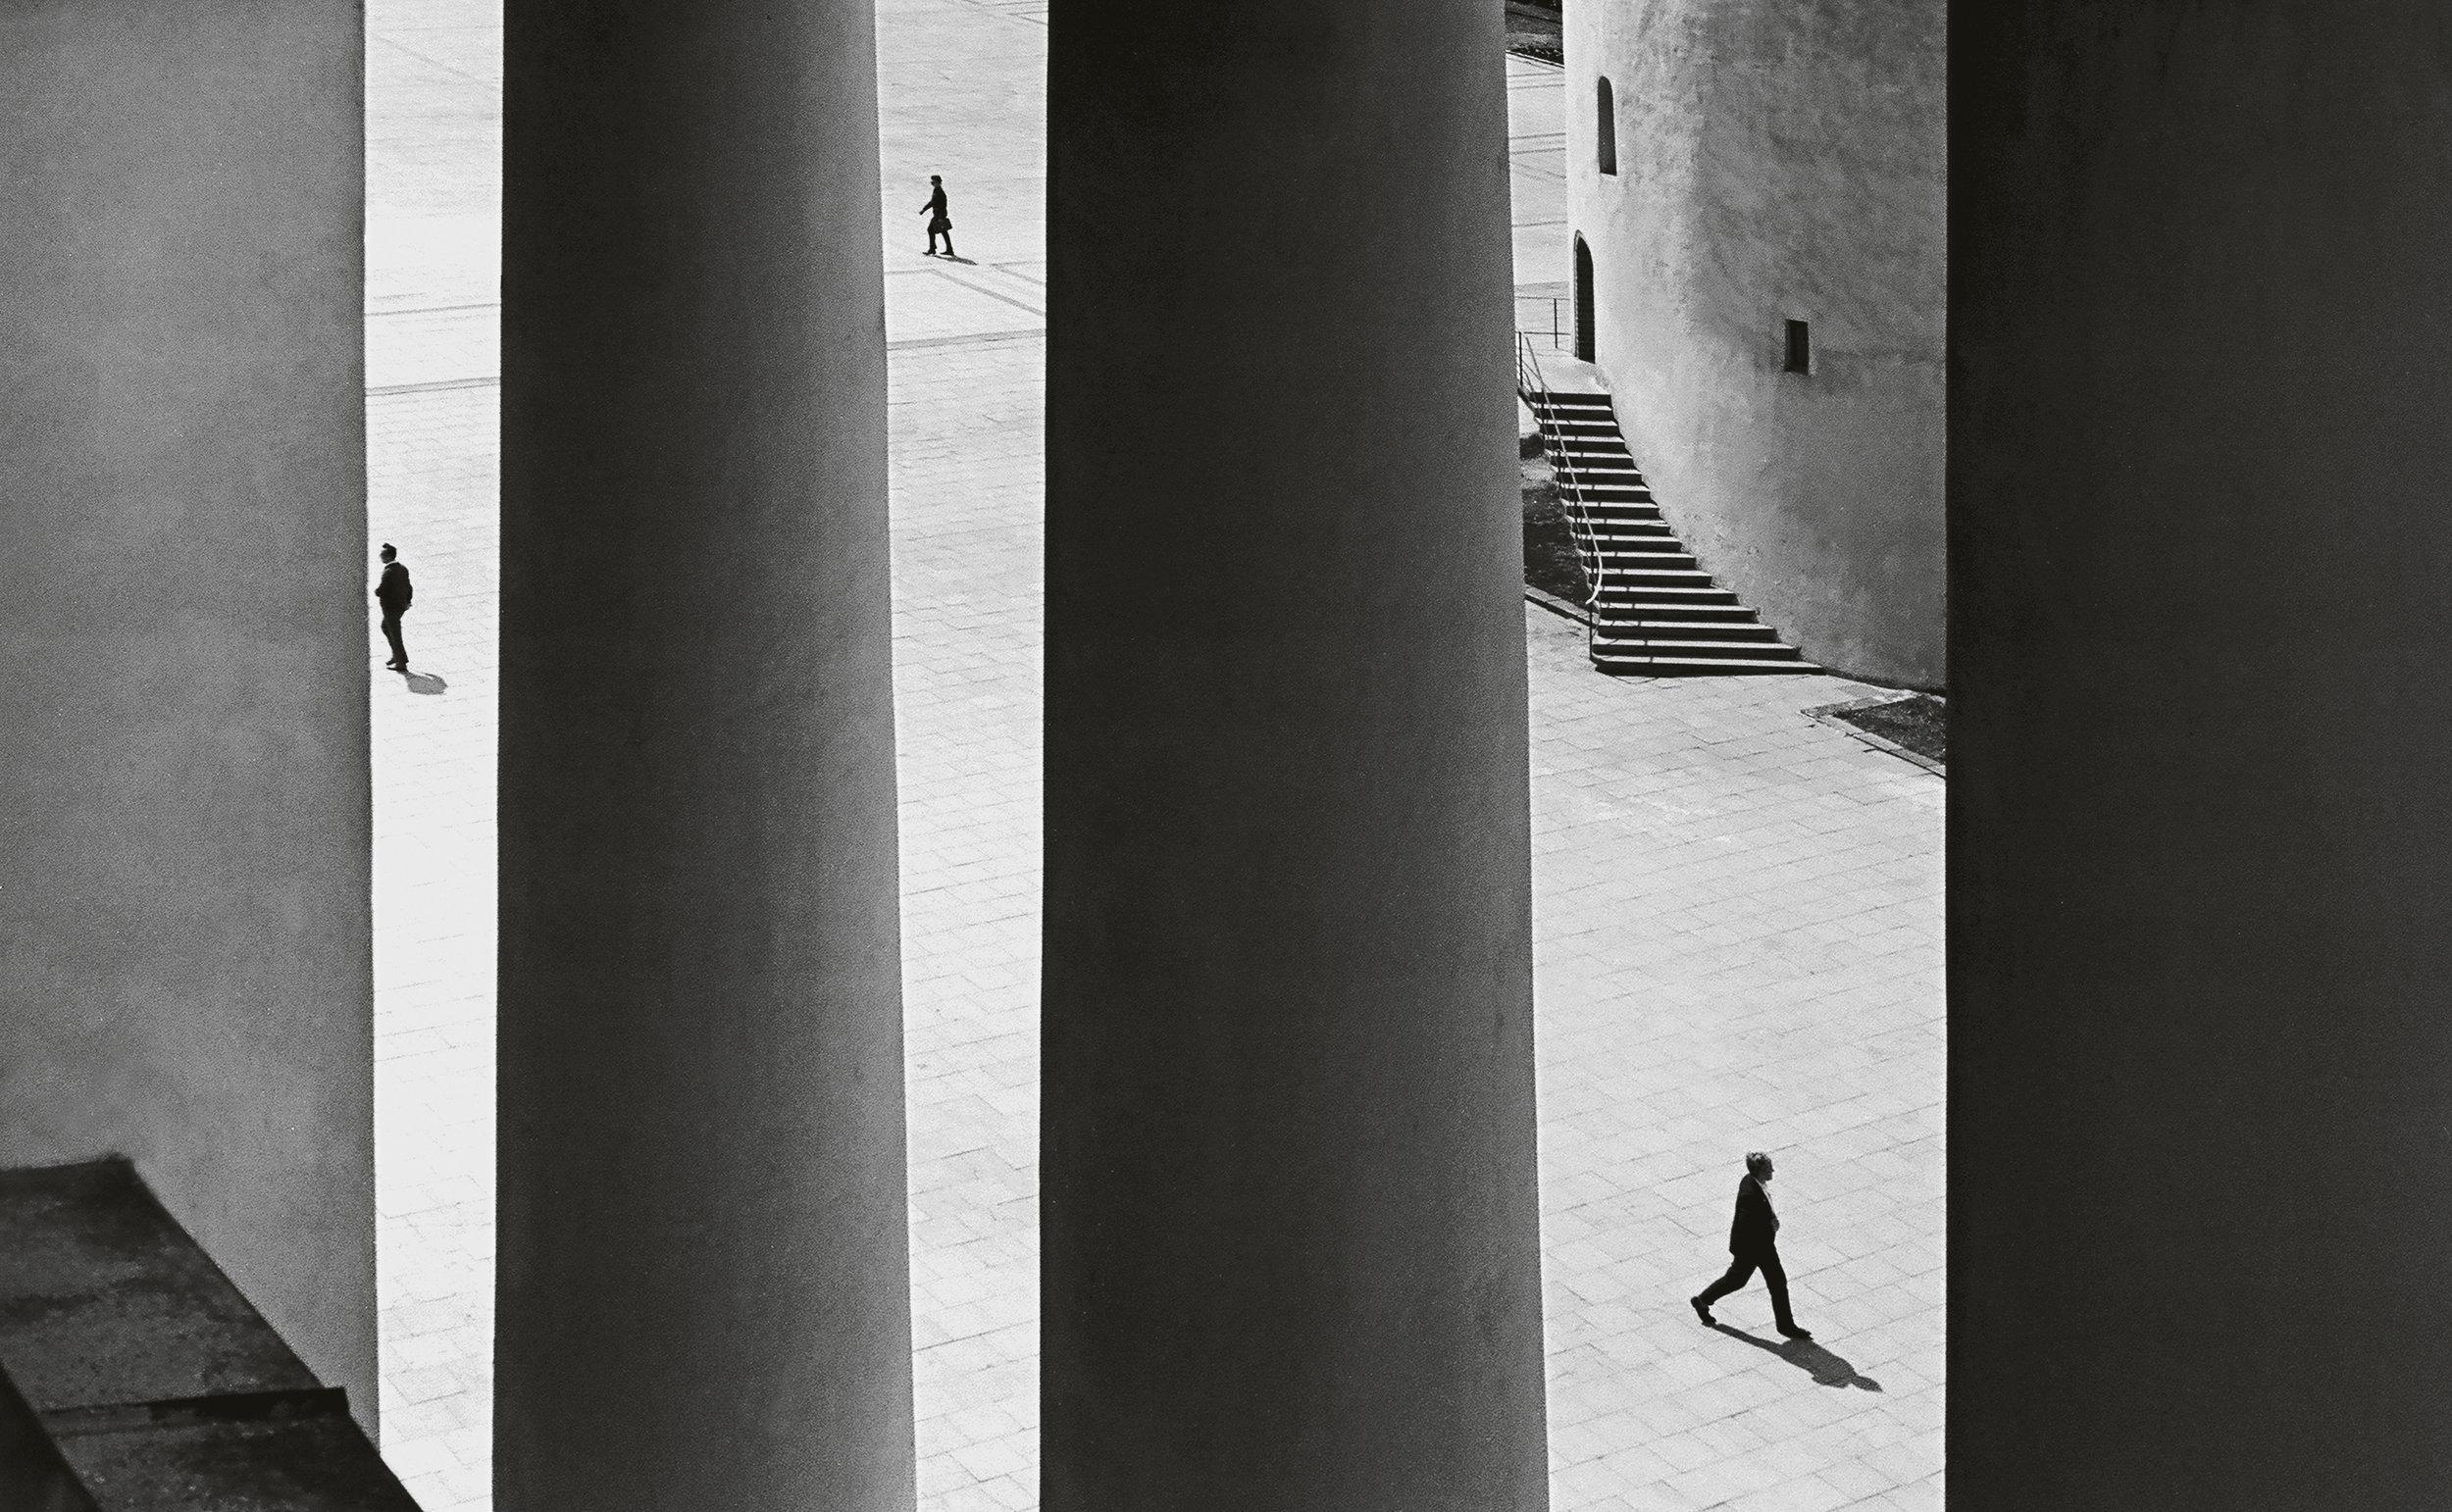 Romualdas Rakauskas,  Weekdays , 1963-1967. Daily Life: Photography from Lithuania on view at The Print Center, Philadelphia